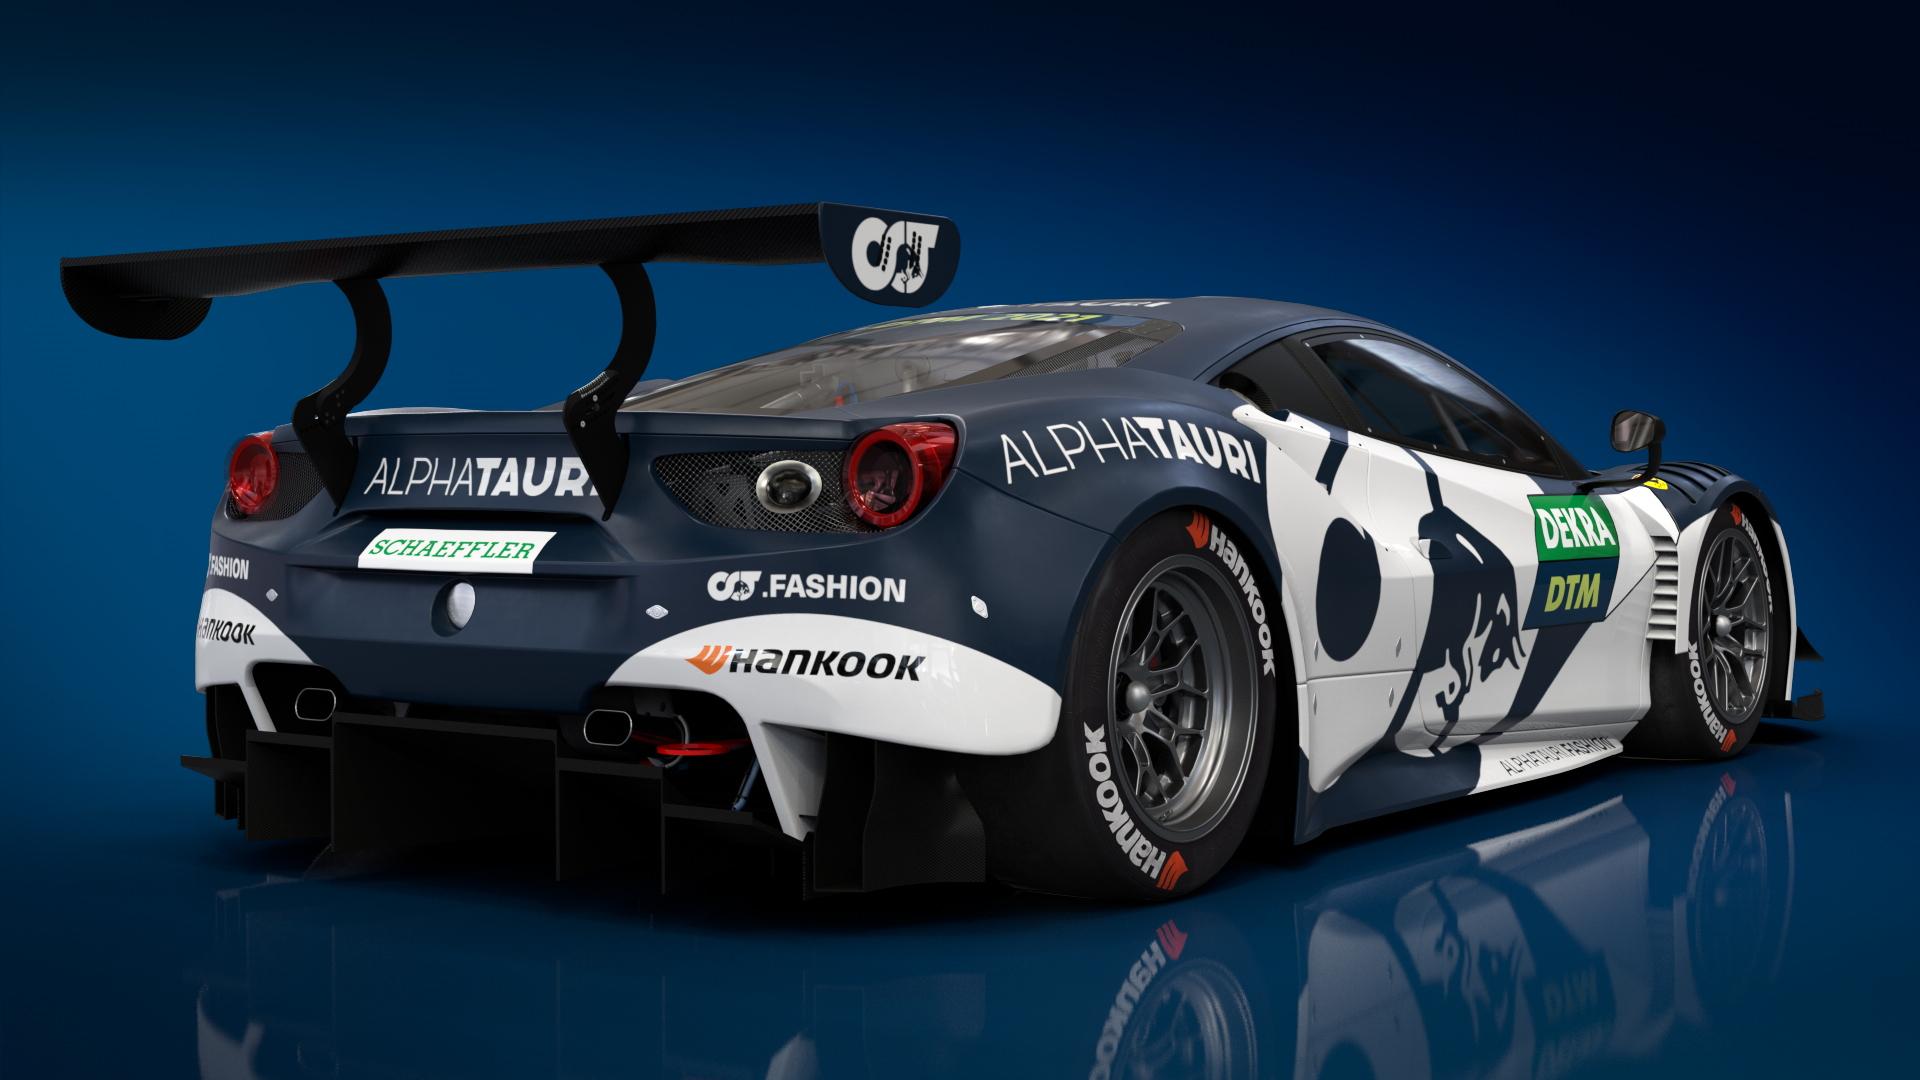 2021 AF Corse Ferrari 488 GT3 Evo DTM race car